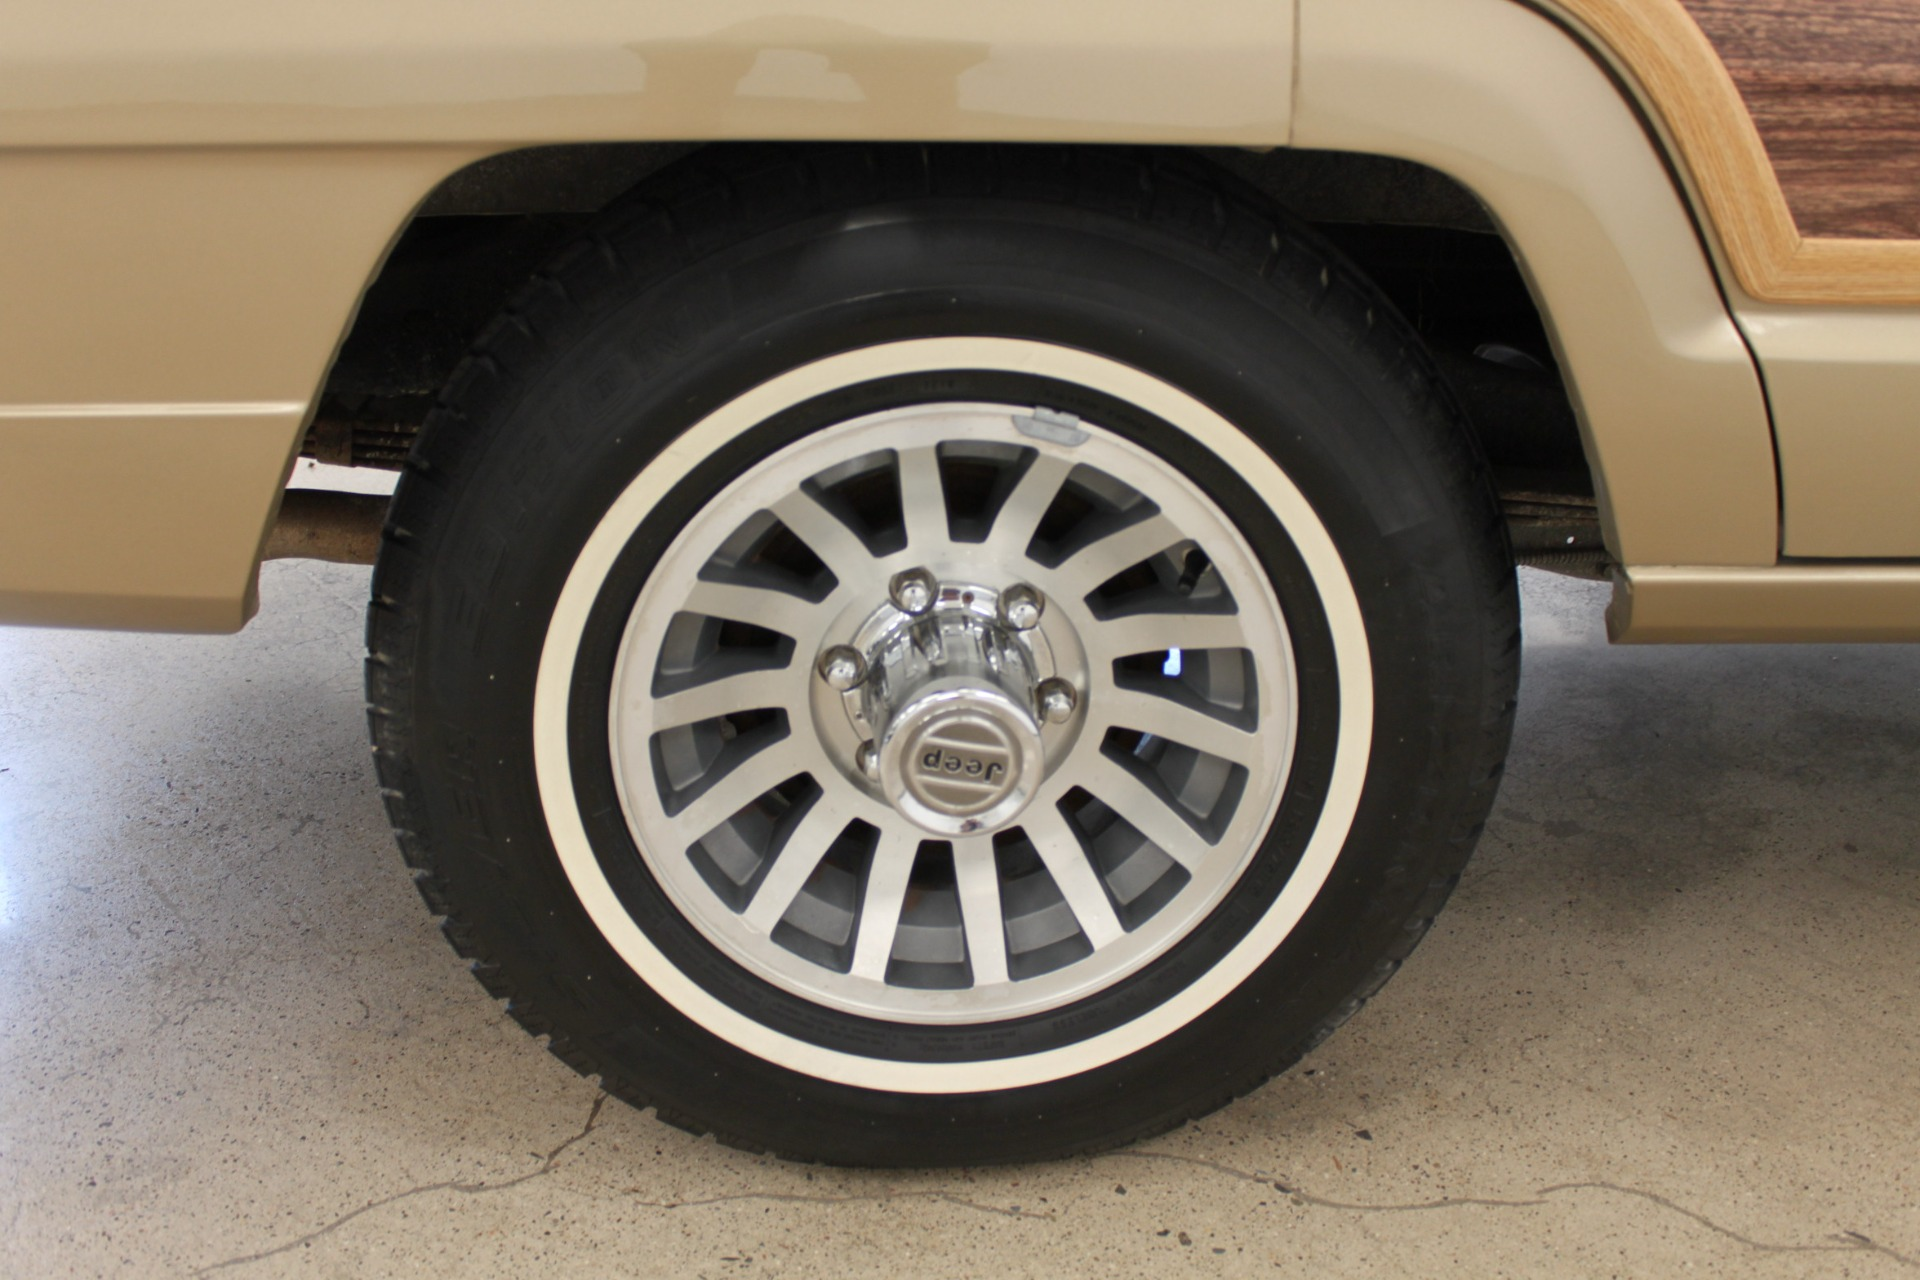 Used-1990-Jeep-Grand-Wagoneer-Audi